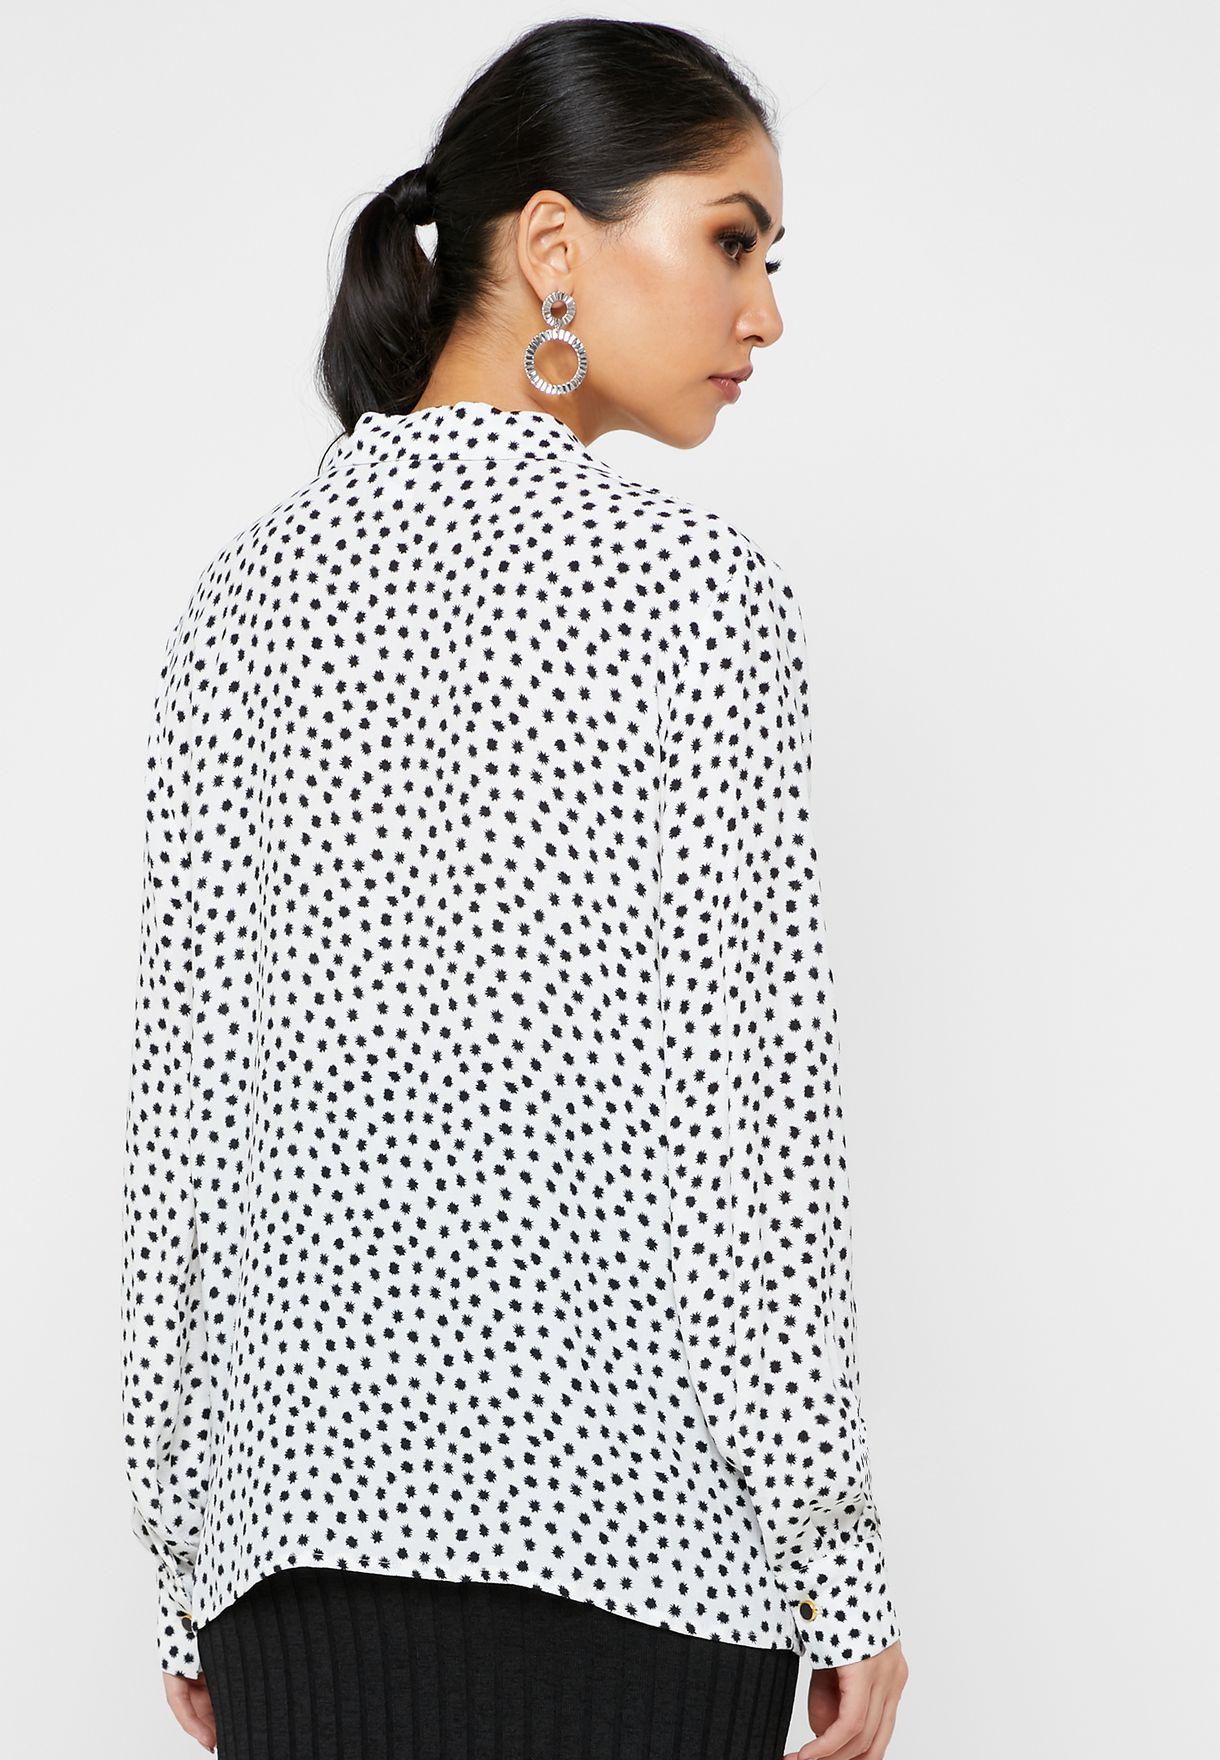 قميص بطبعات نقاط بولكا